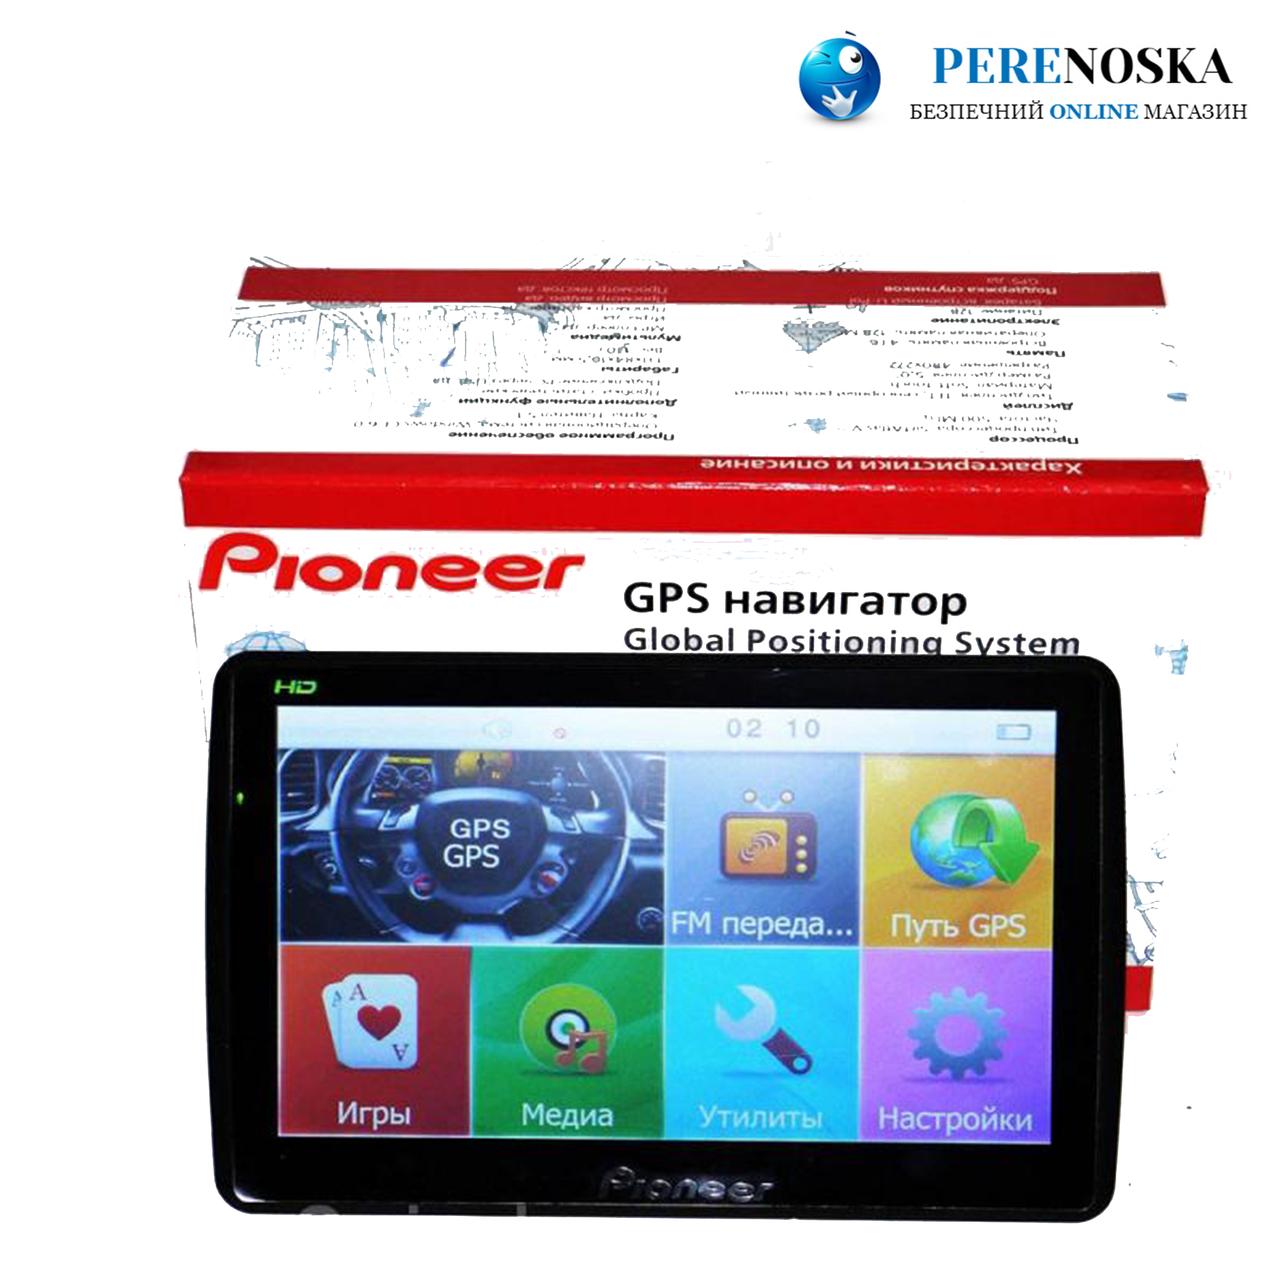 GPS навигатор Pioneer/ 7 дюймов HD/ 4Gb + FM/ Карты (IGO+Navitel)